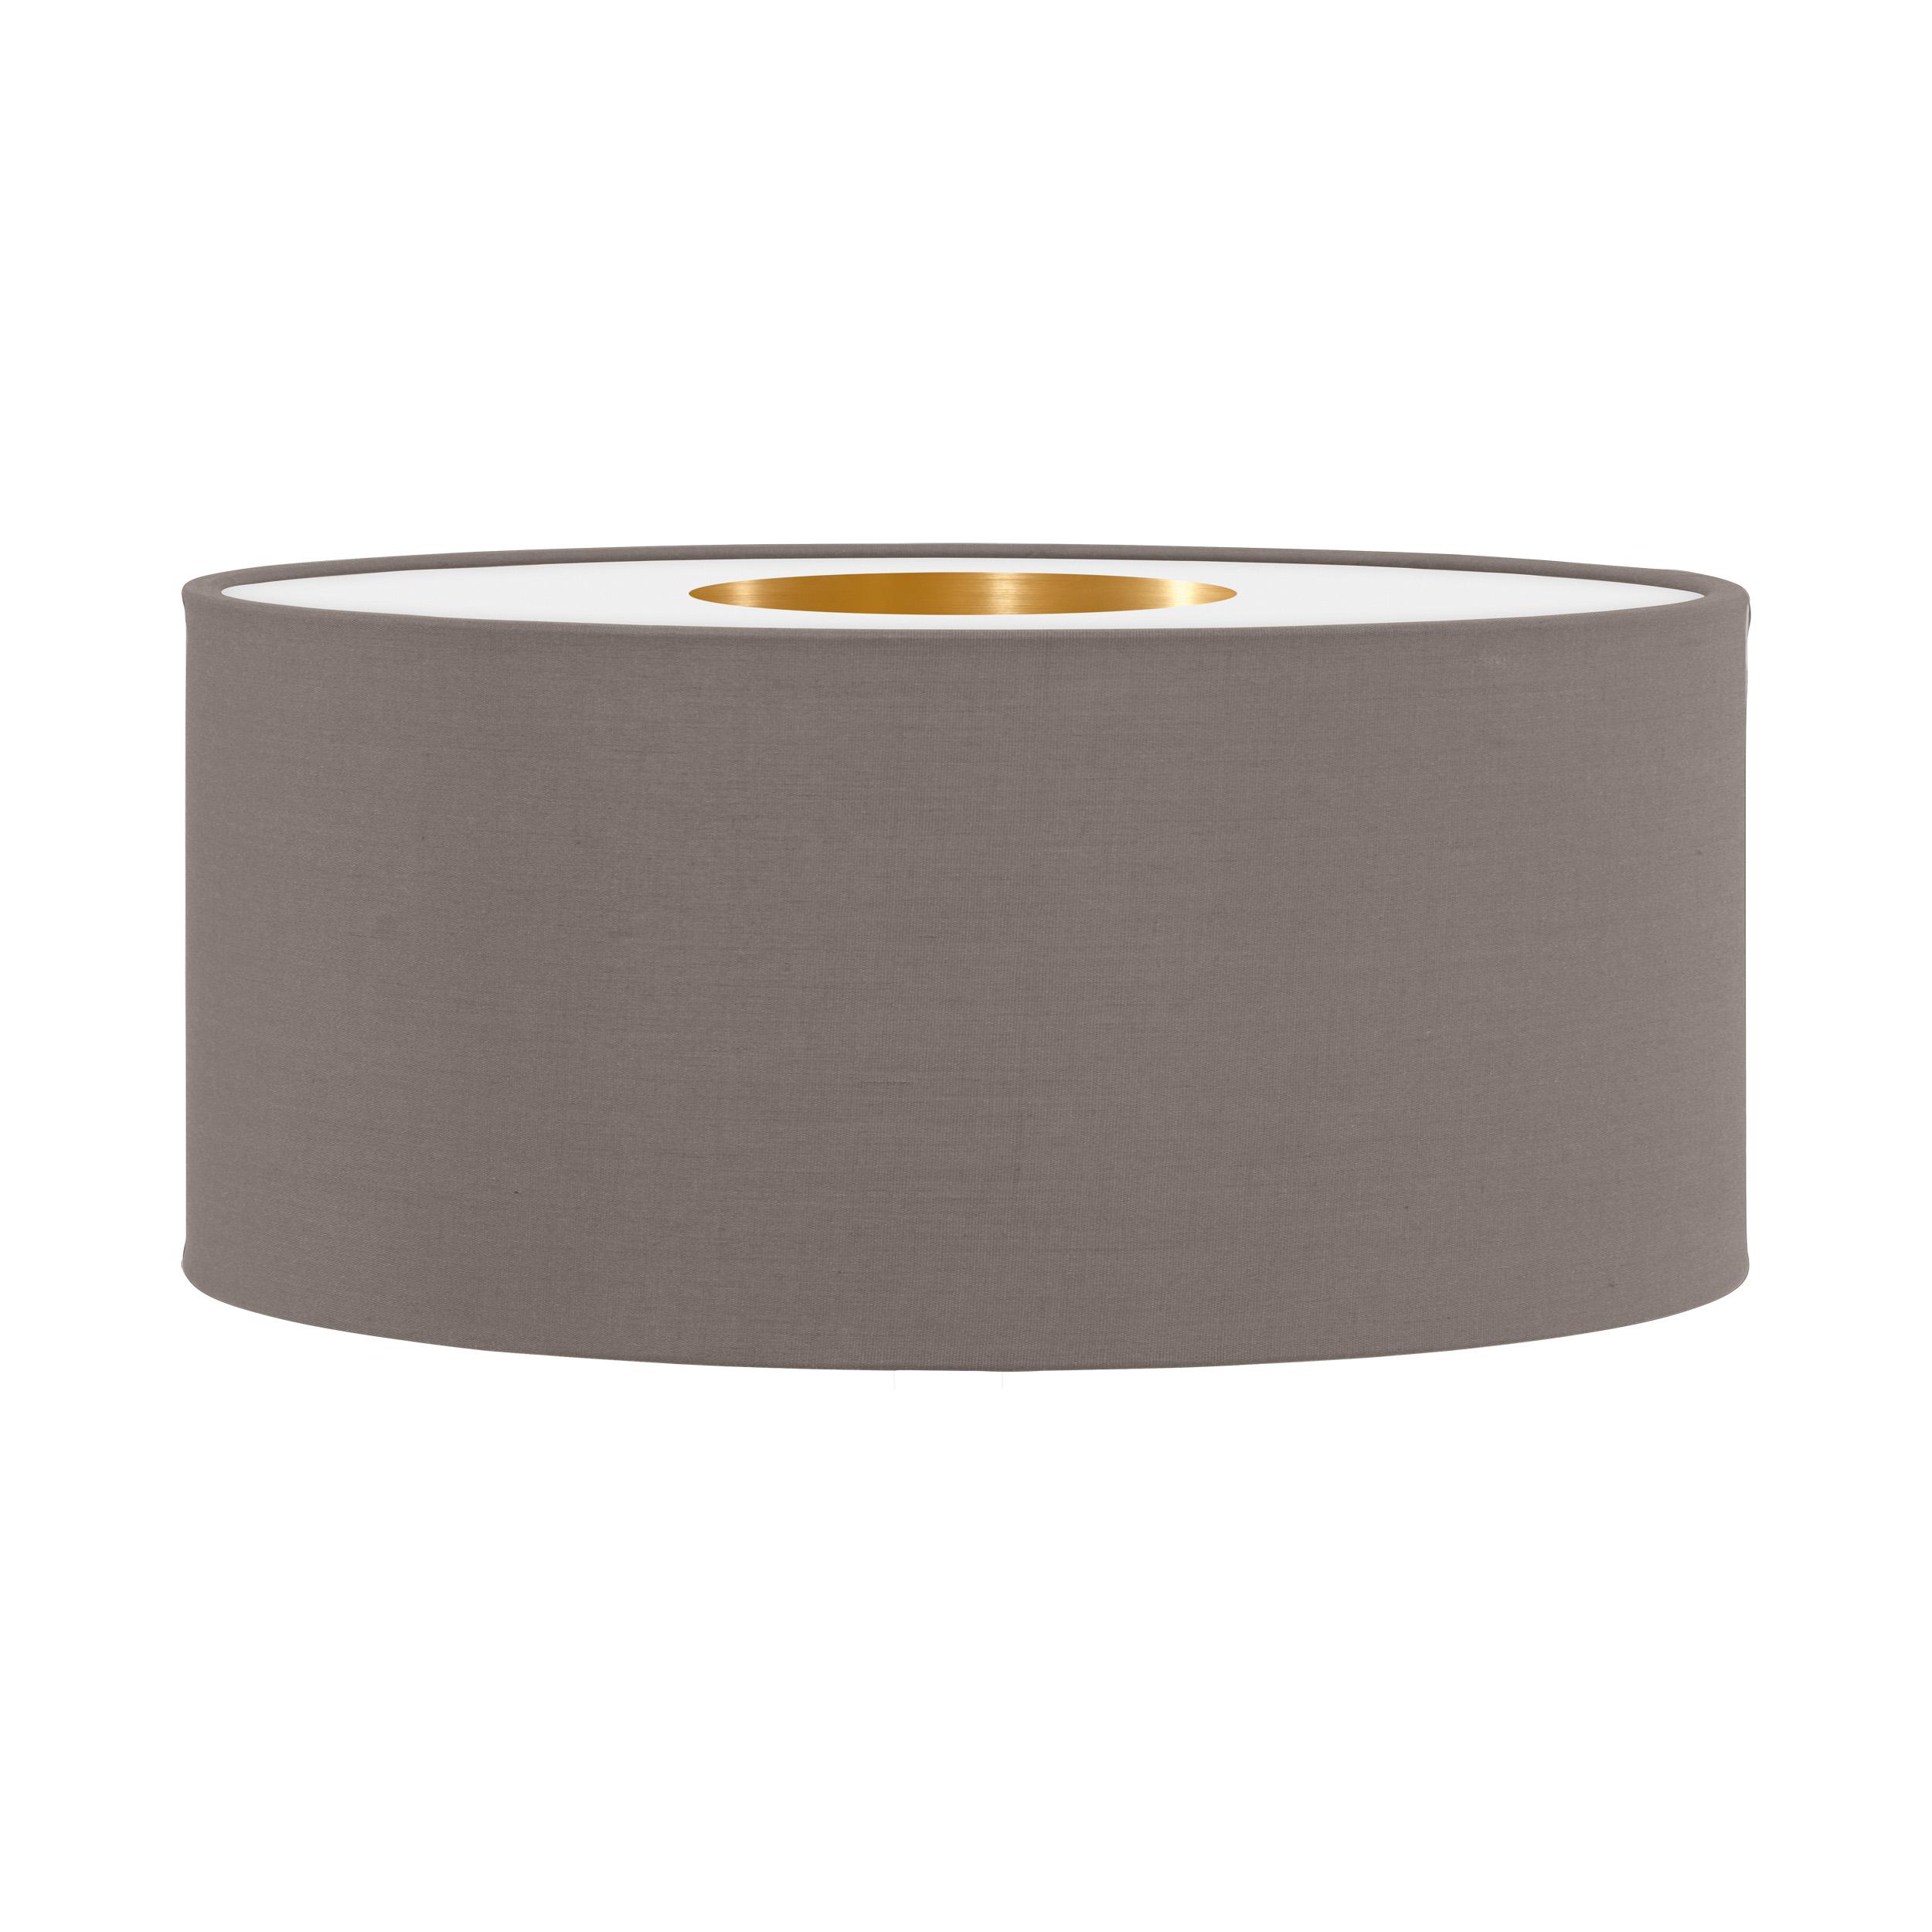 1 Stk Schirm Pasteri Pro inkl. Diffuser cappuccino/gold  LI62696---